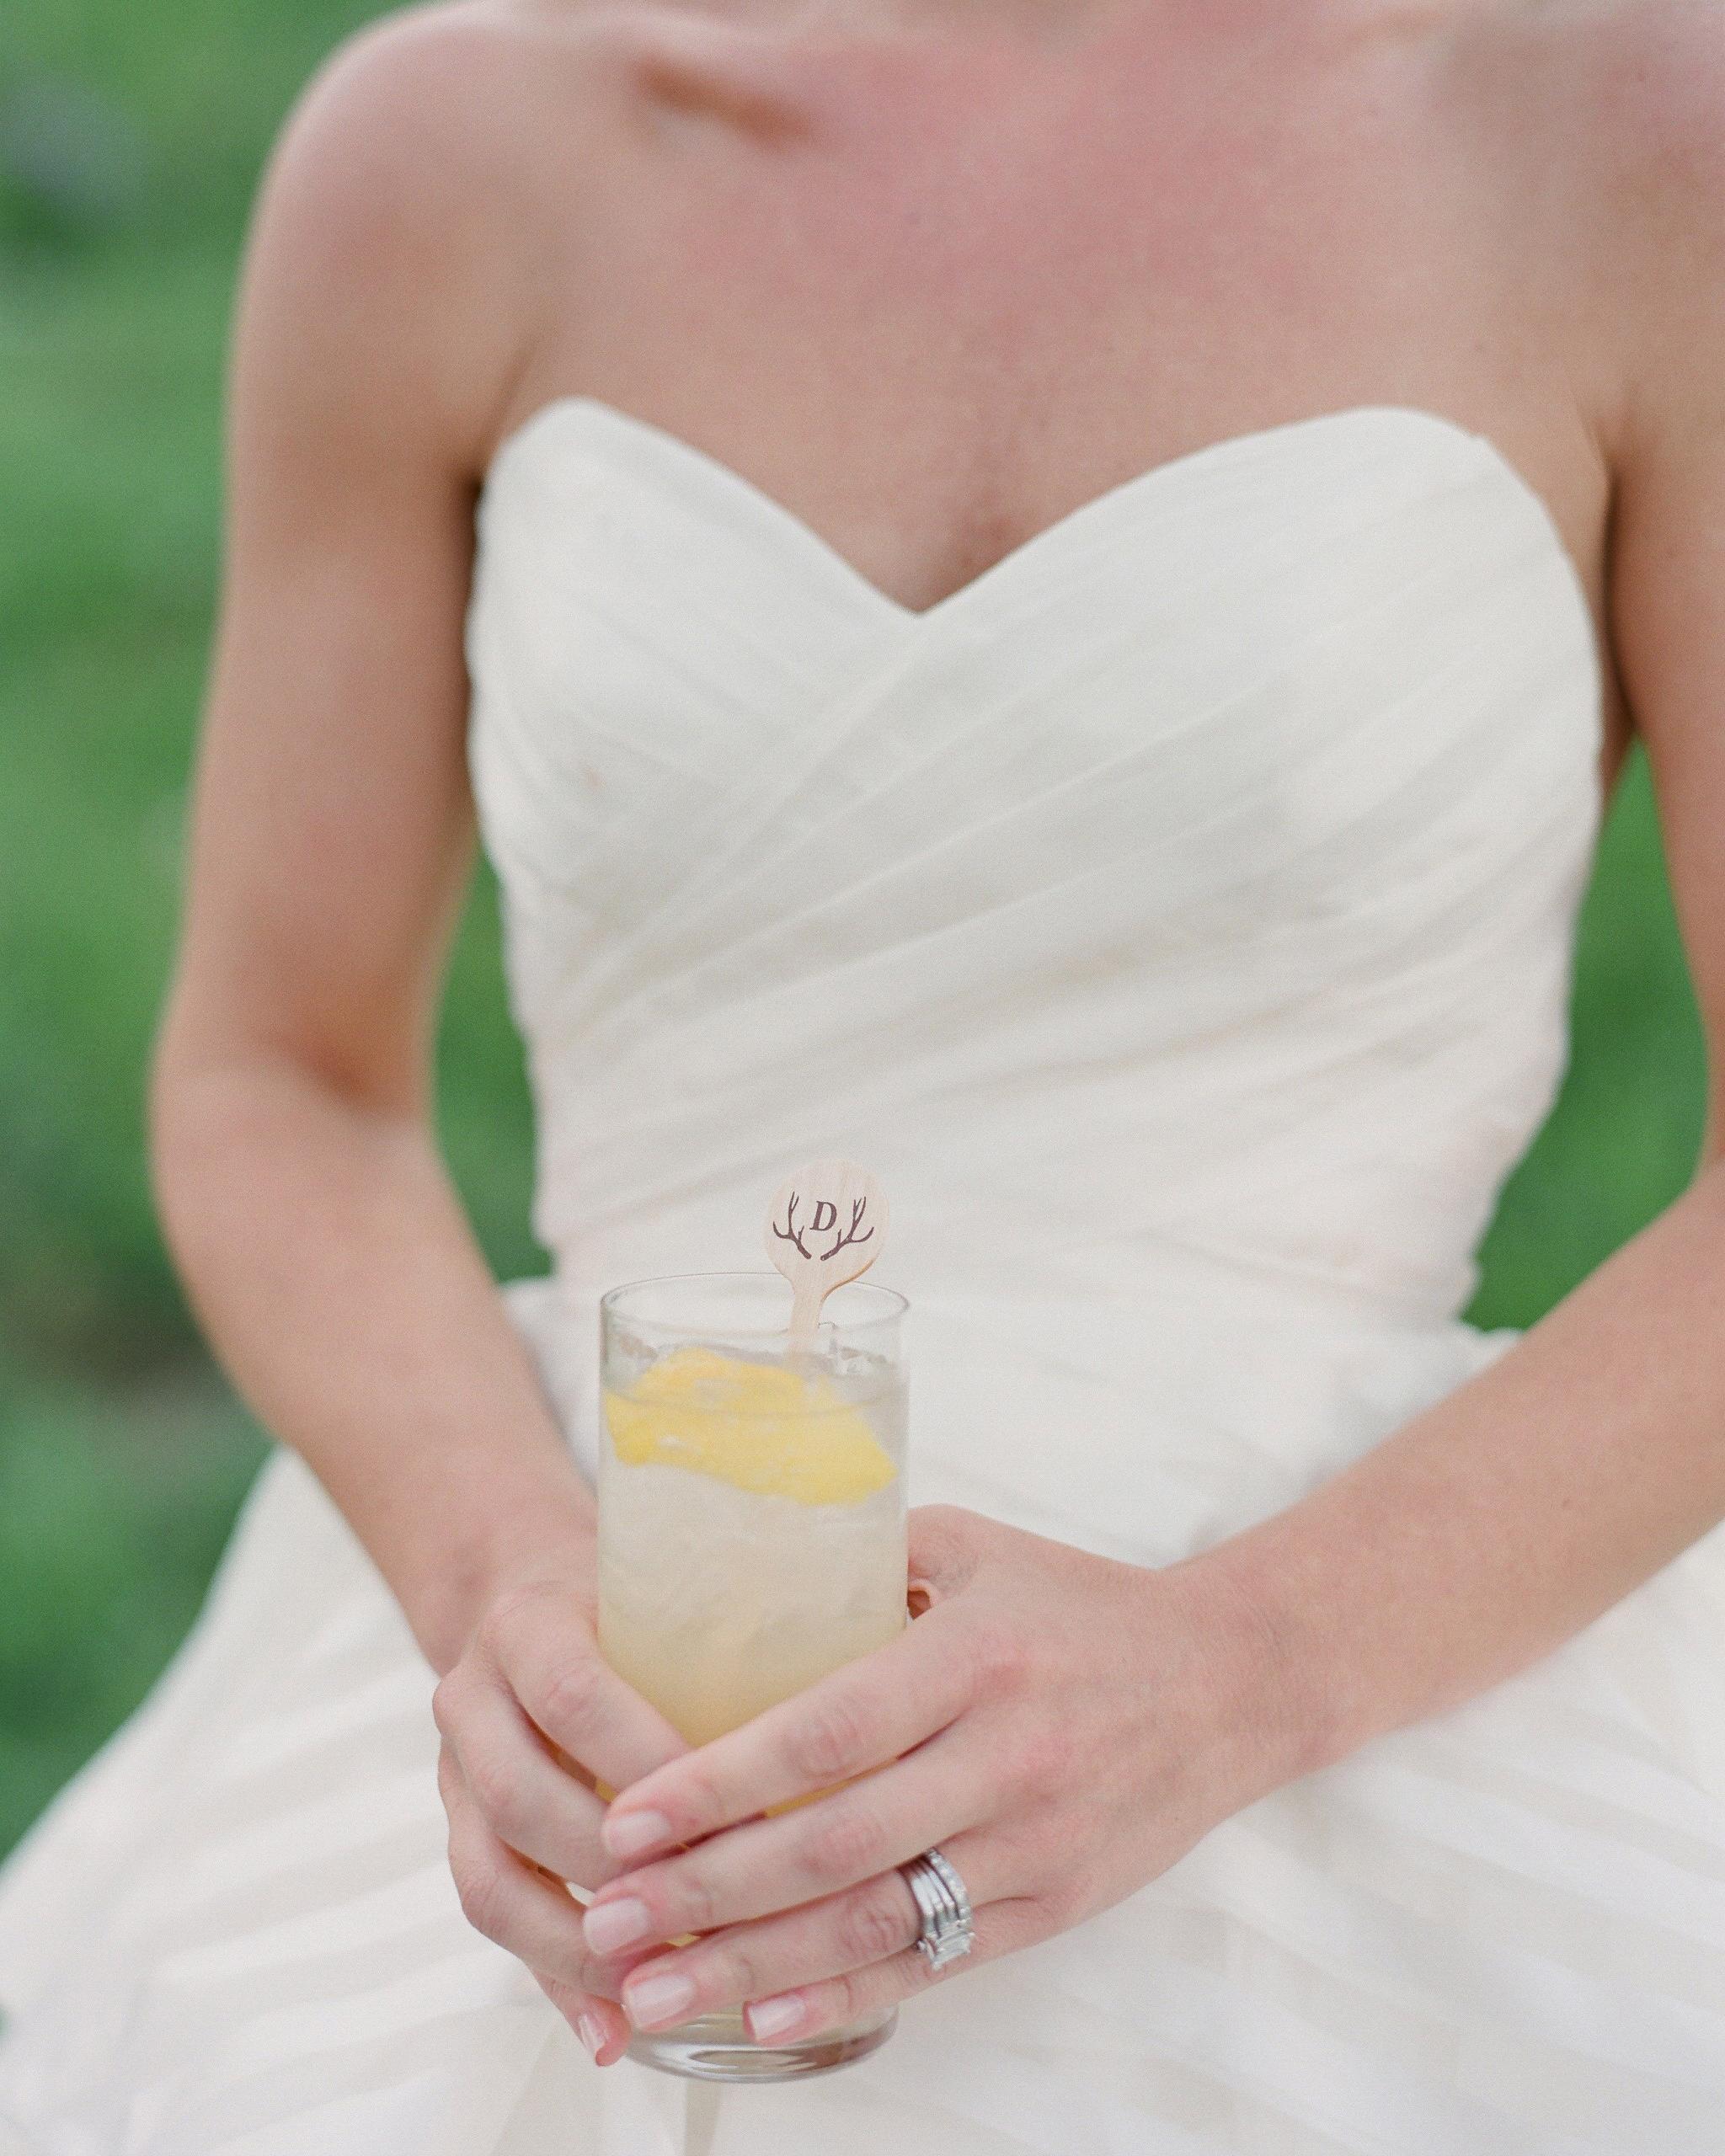 stacey-eric-wedding-drink-20-s111513-1014.jpg